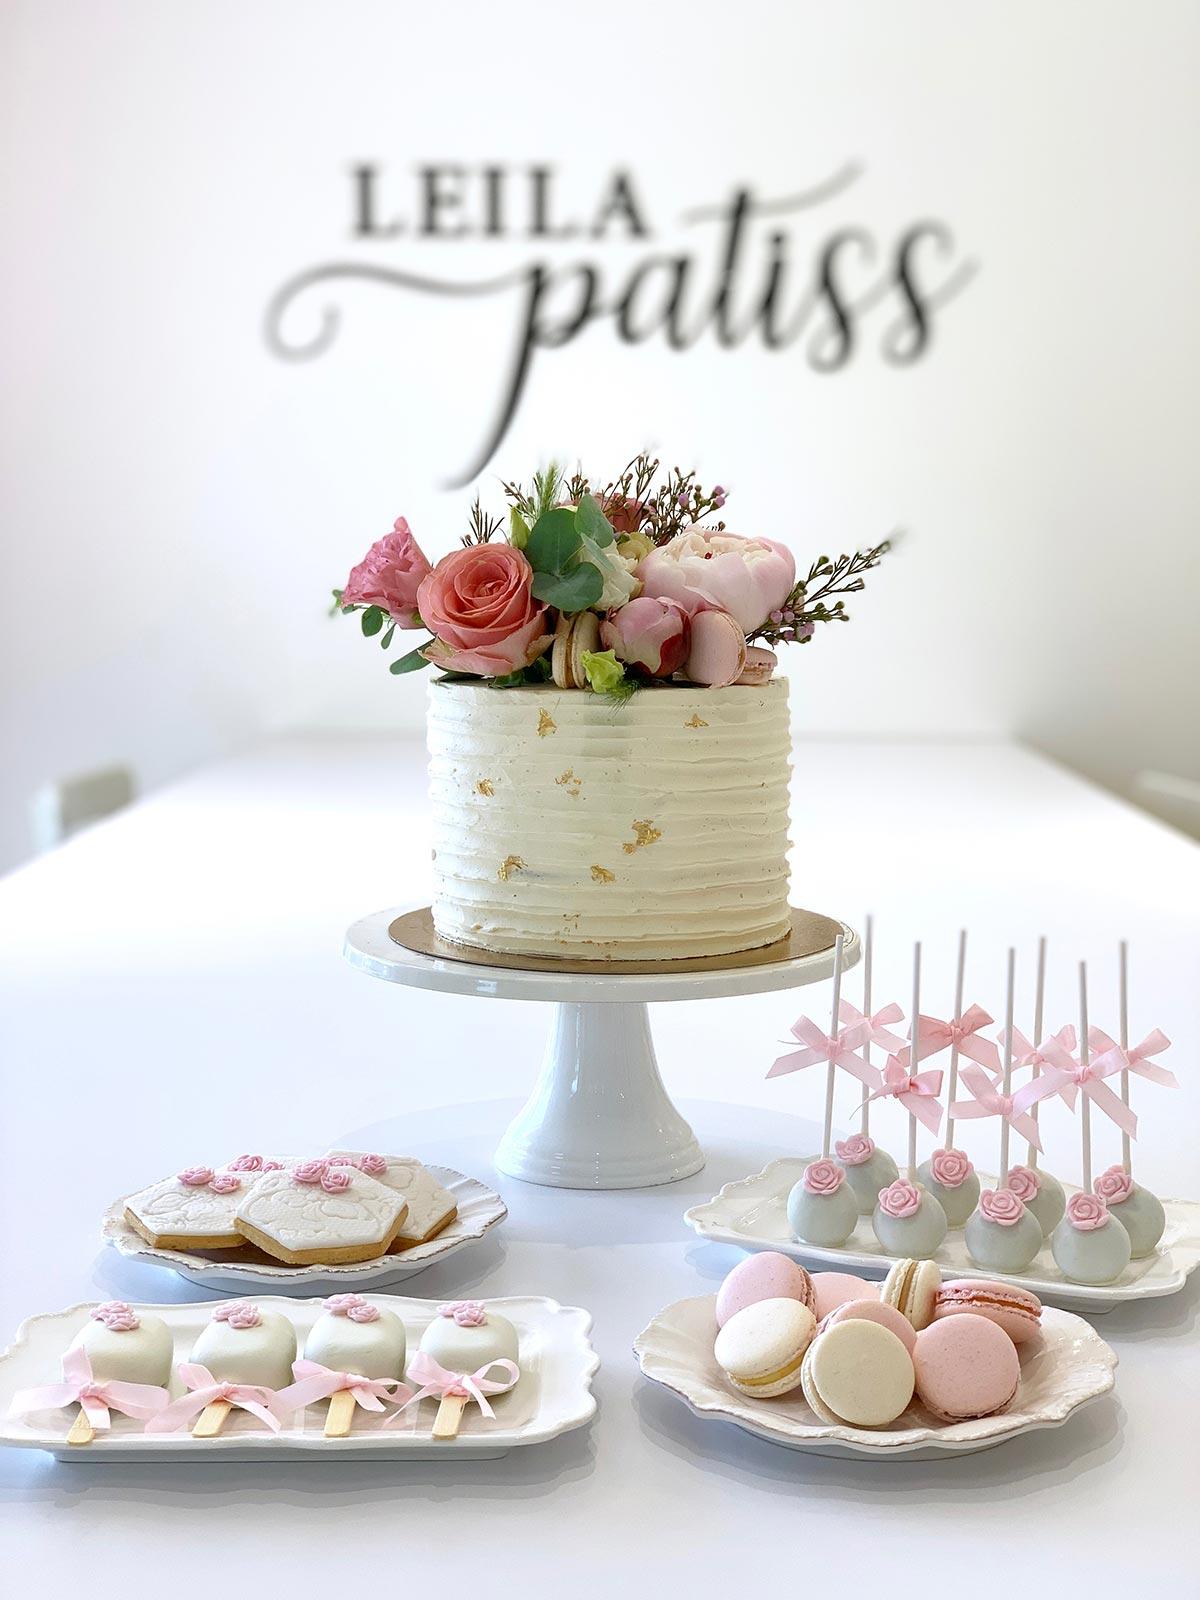 Leila Patiss | La mariée enchantée